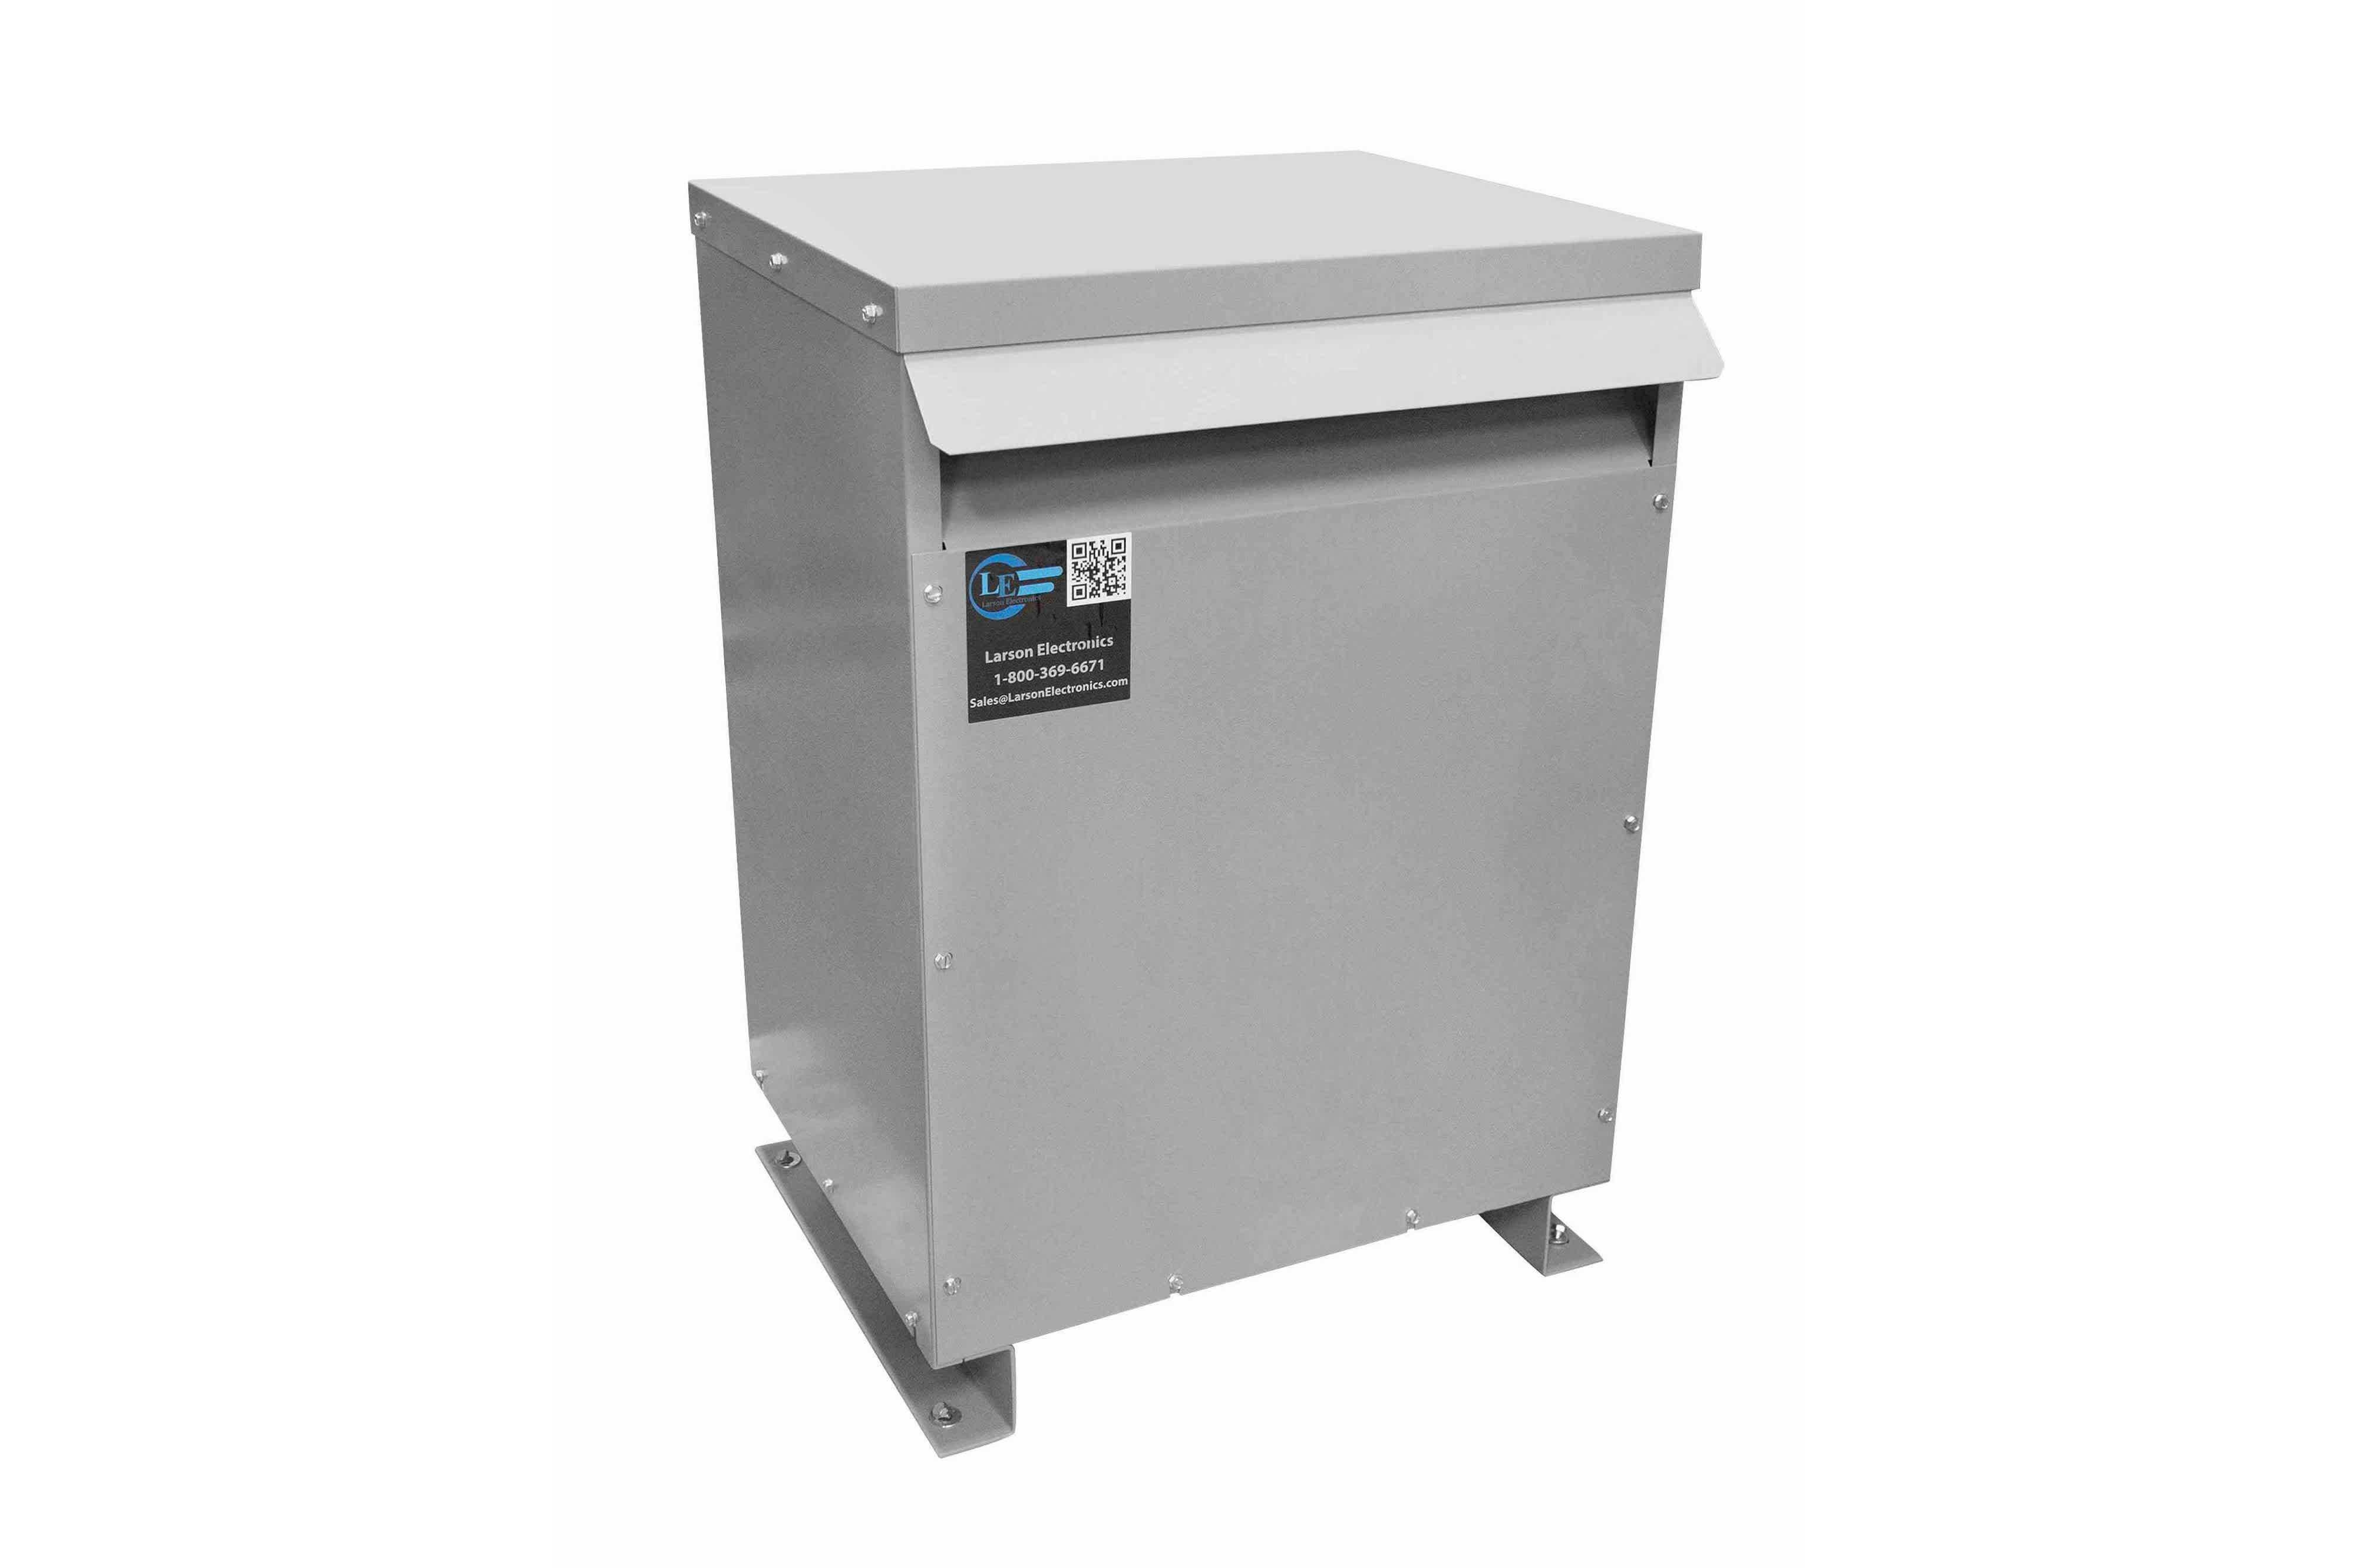 50 kVA 3PH DOE Transformer, 480V Delta Primary, 415Y/240 Wye-N Secondary, N3R, Ventilated, 60 Hz